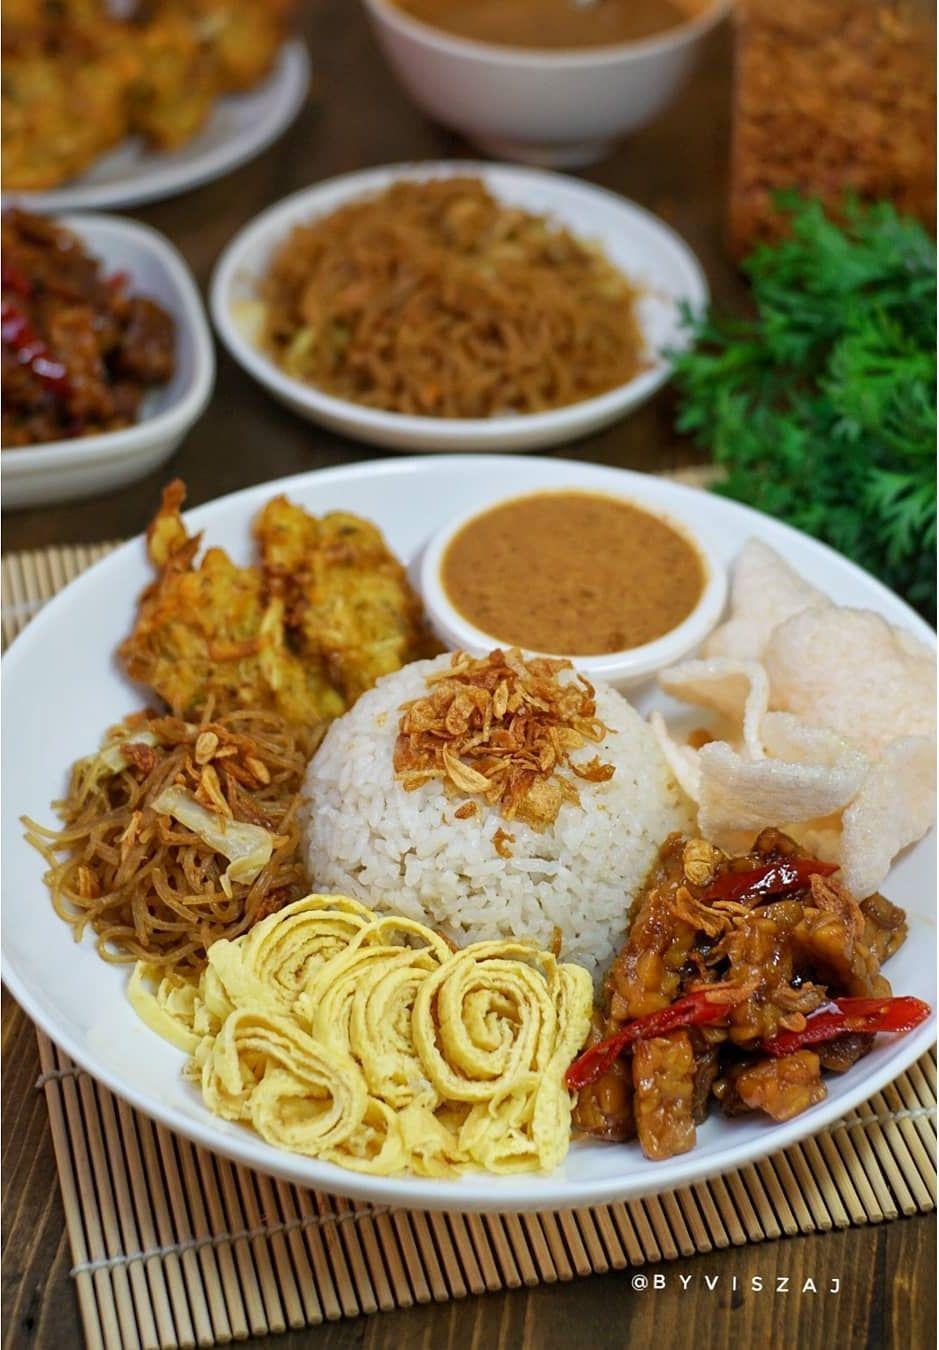 Resep Nasi Uduk C 2020 Brilio Net Resep Masakan Resep Masakan Sehat Masakan